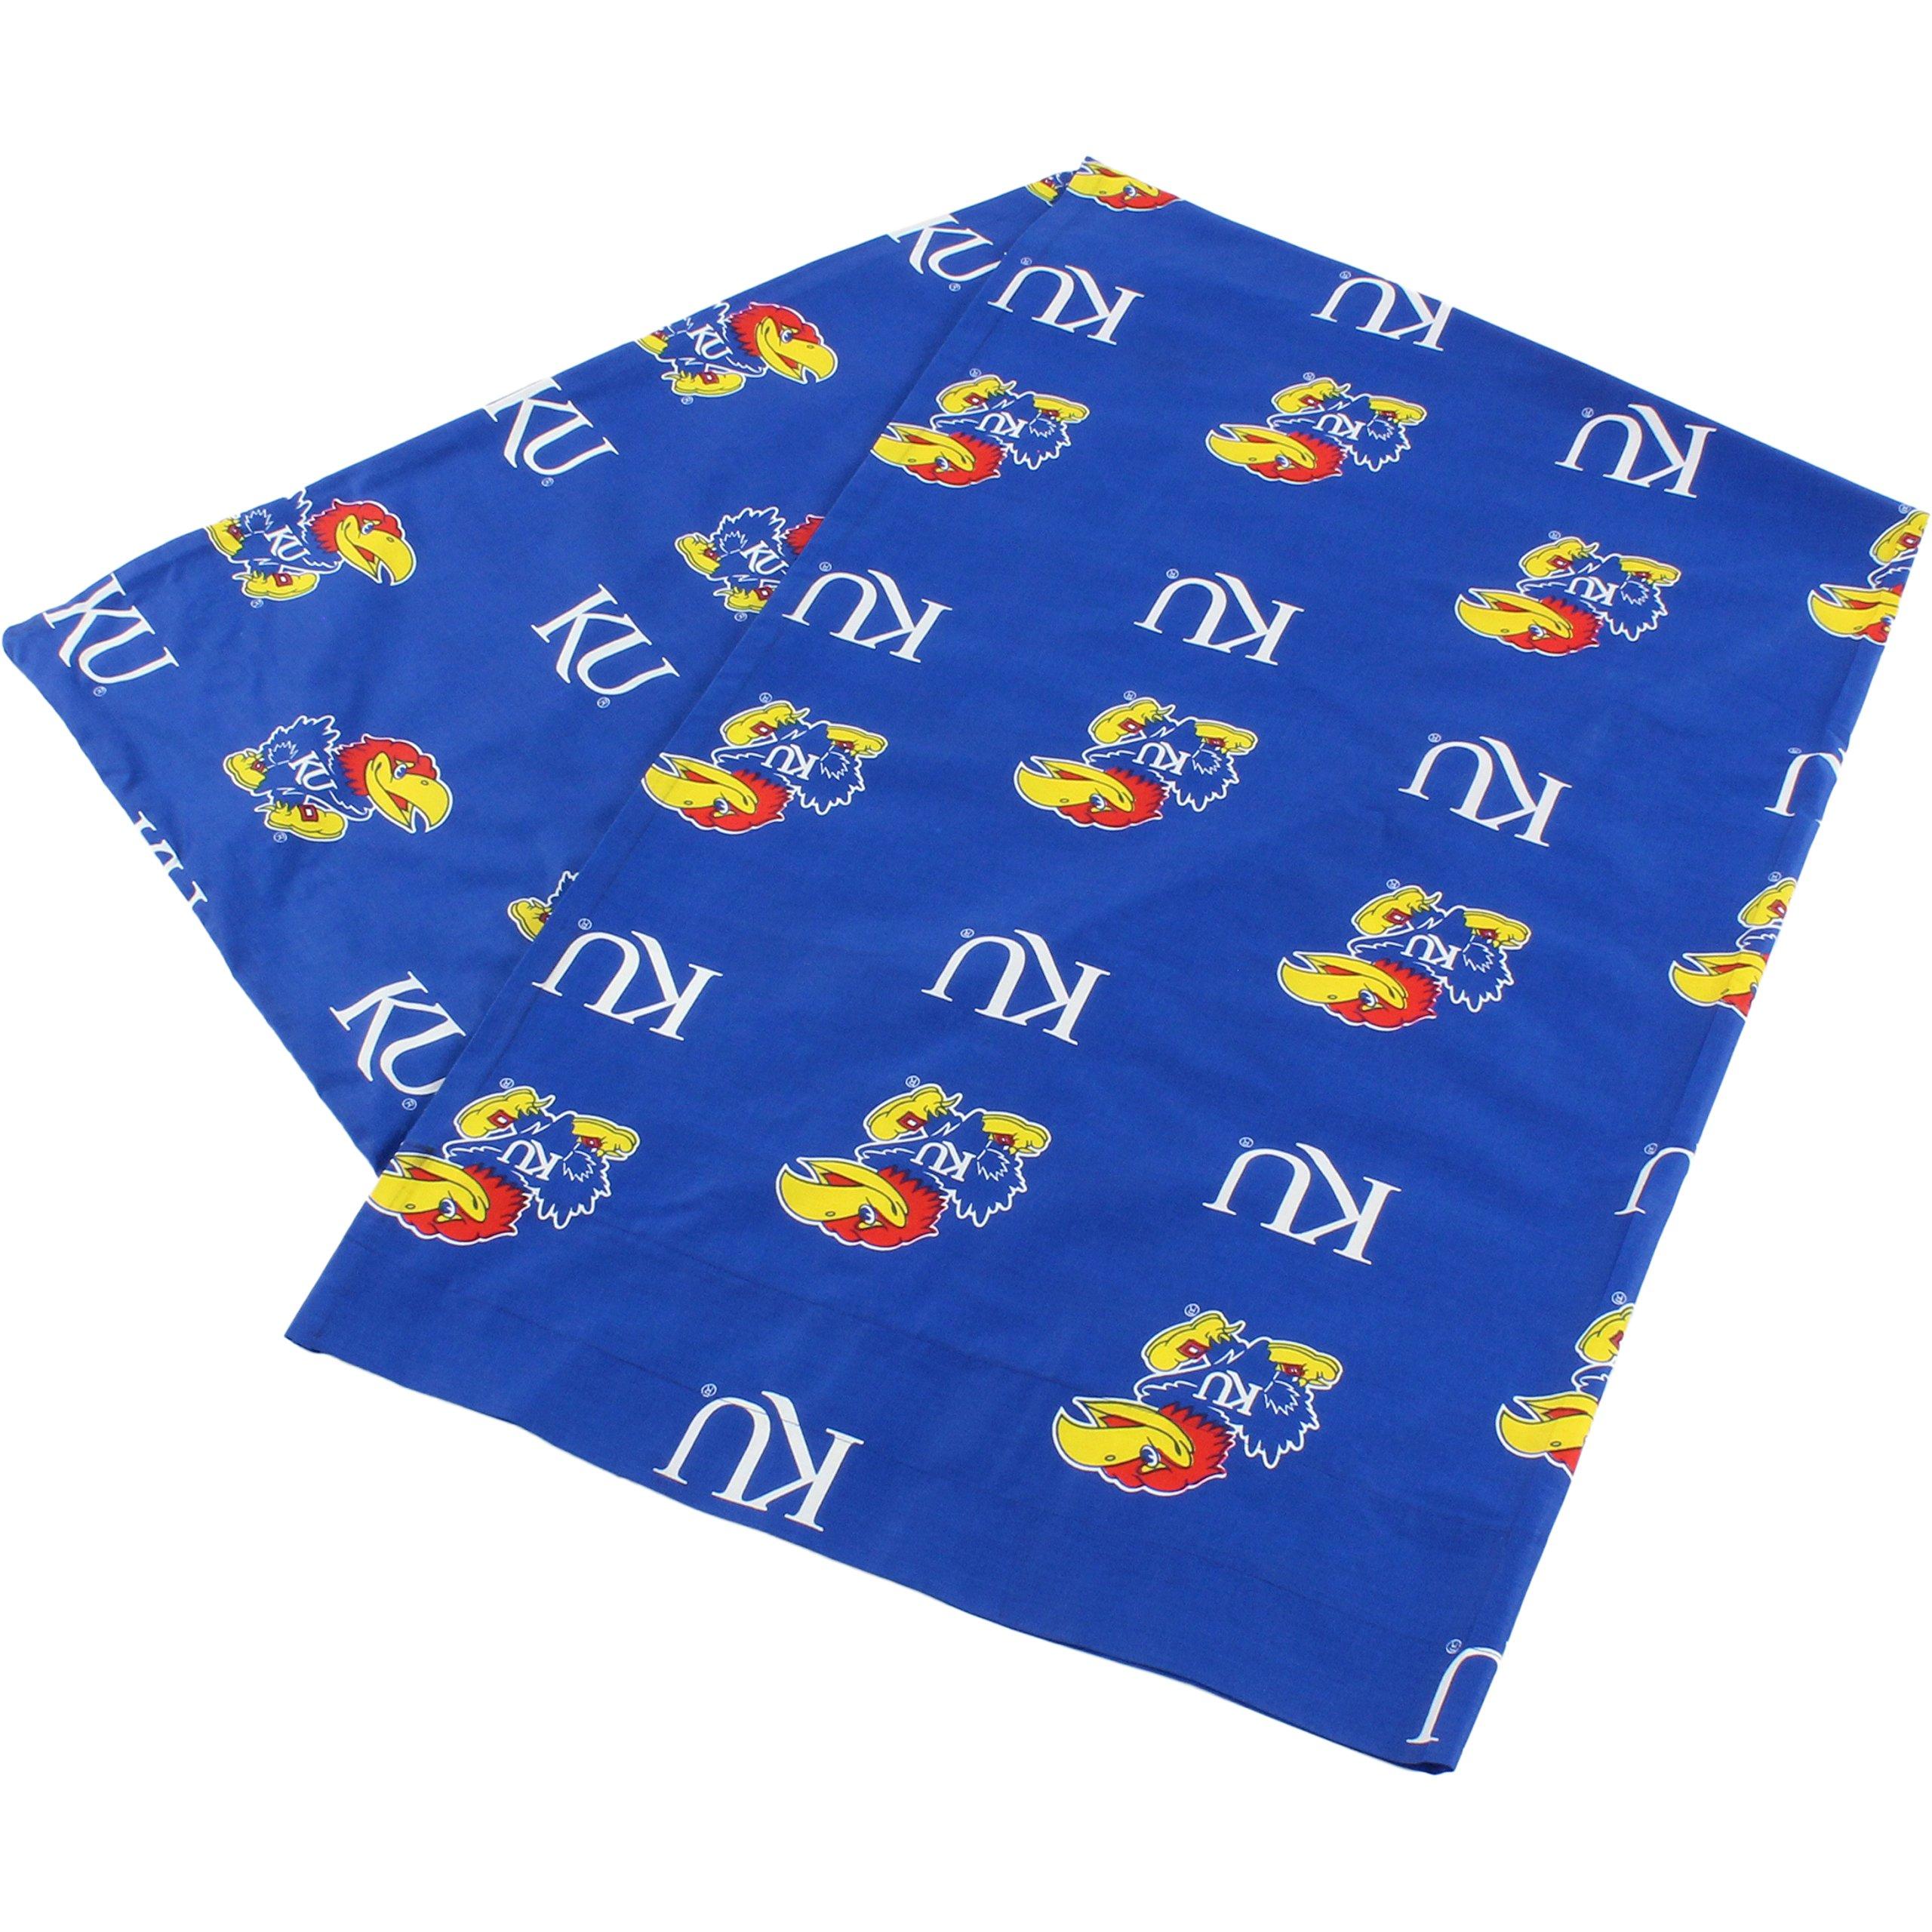 College Covers Kansas Jayhawks Pillowcase Only-Body Pillow, 20'' x 60'', Blue